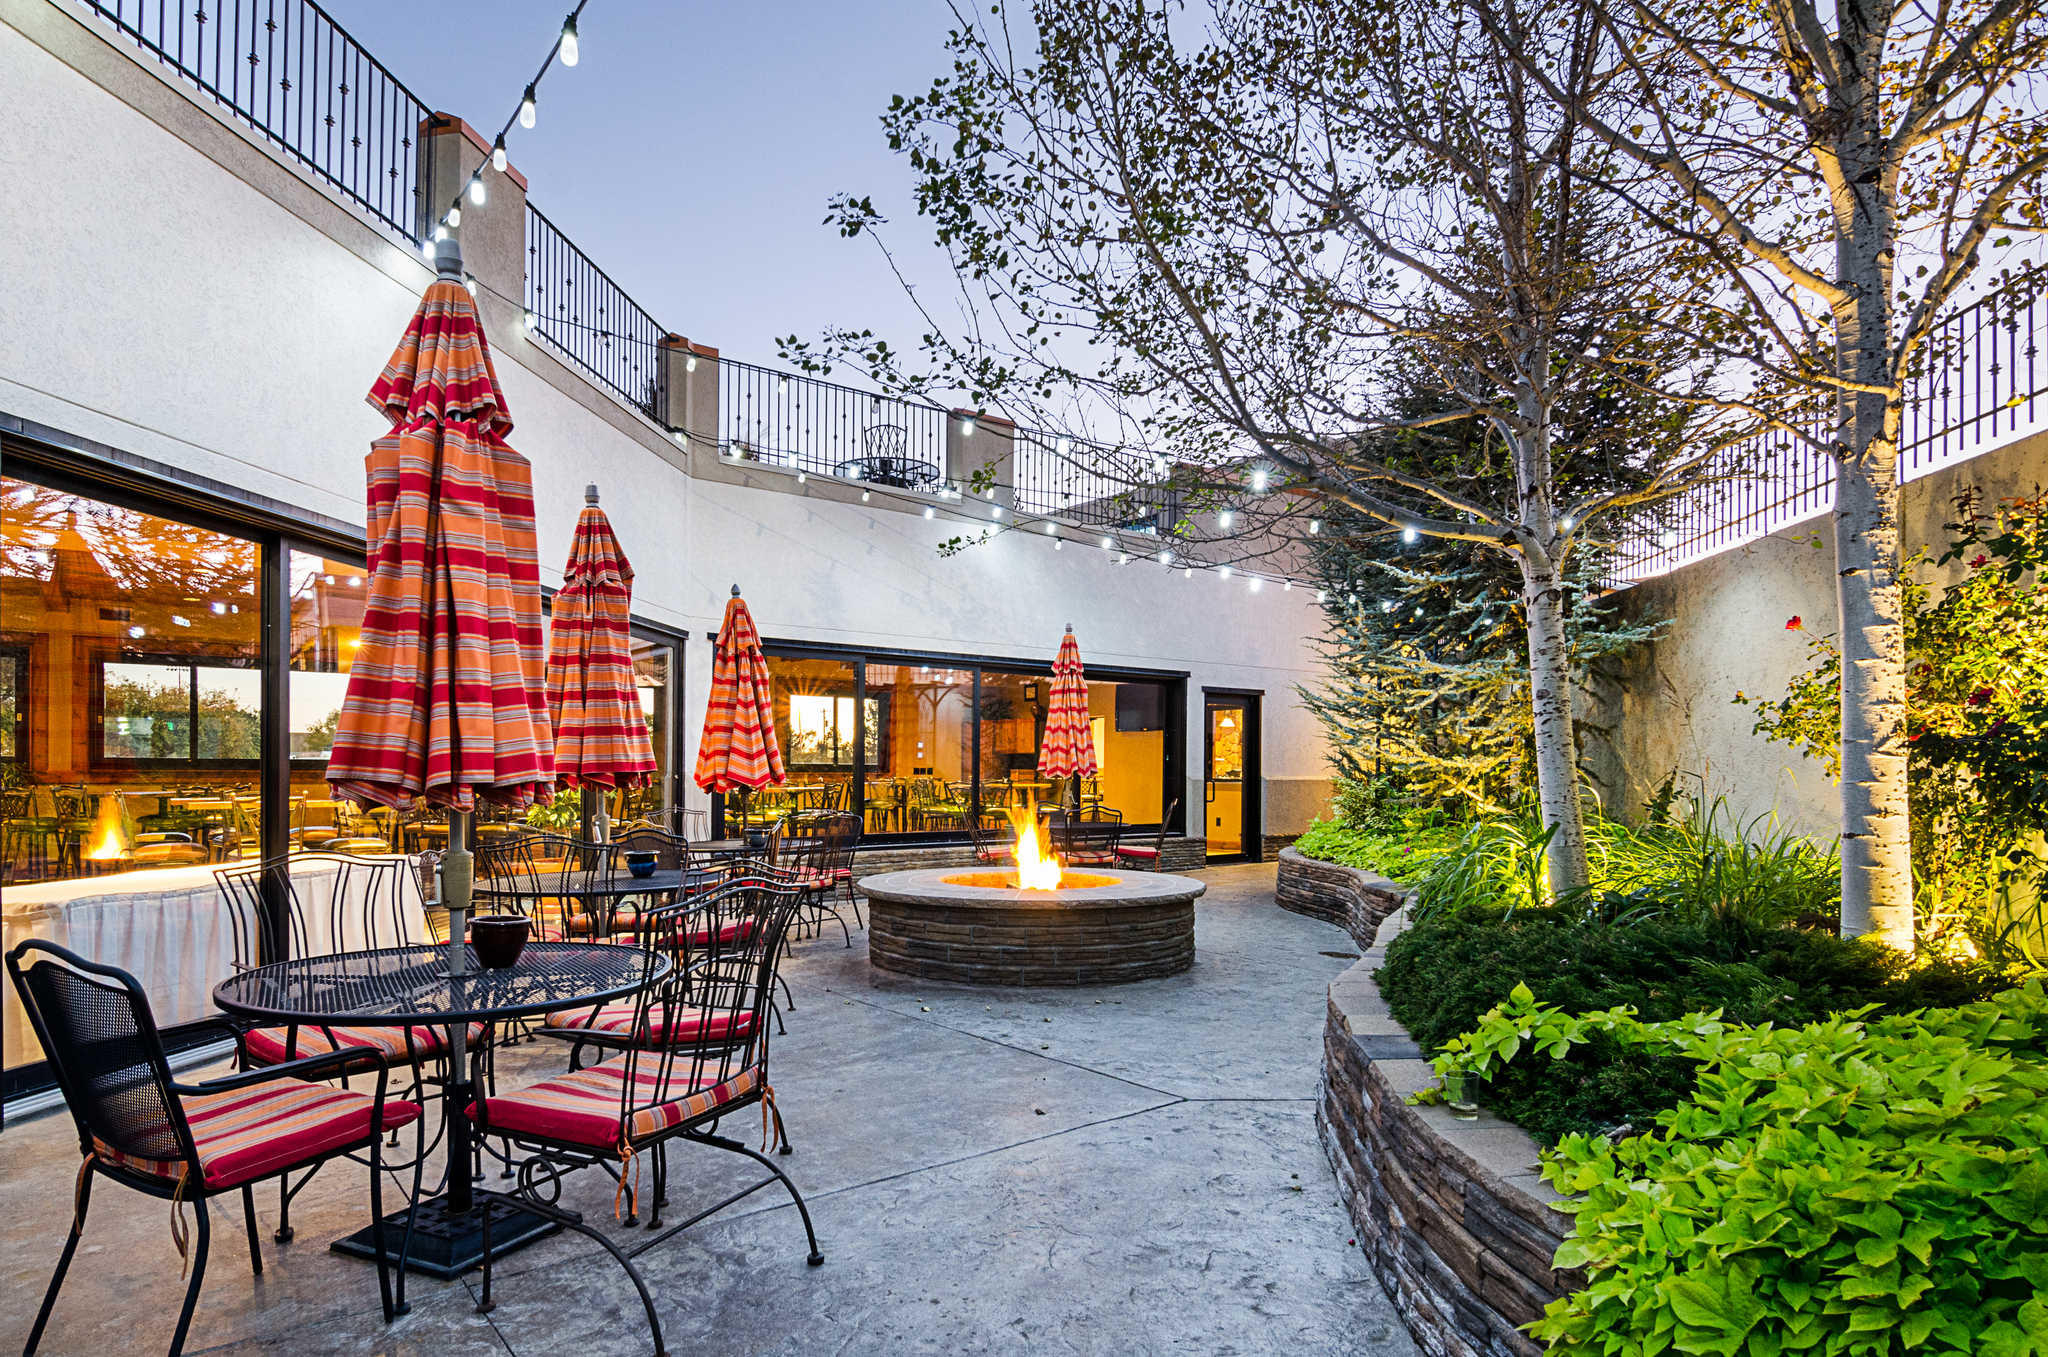 clarion inn garden city ks company page